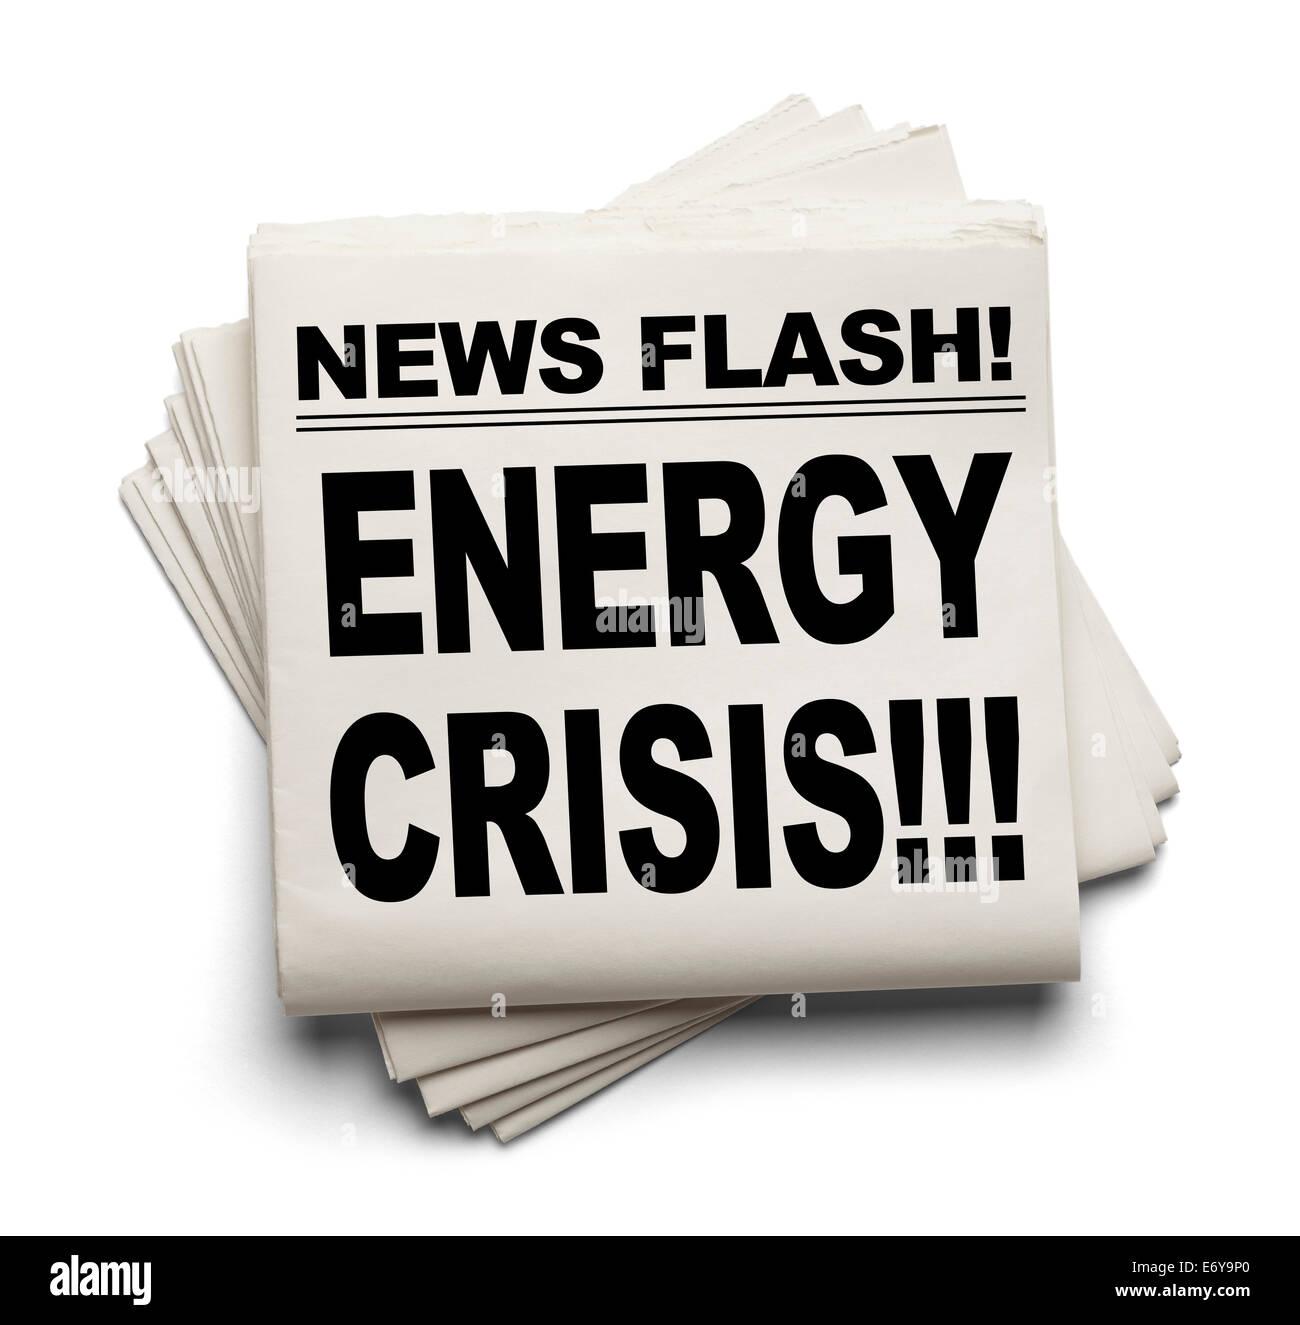 News Flash Energy Crisis News Paper Isolated on White Background. - Stock Image